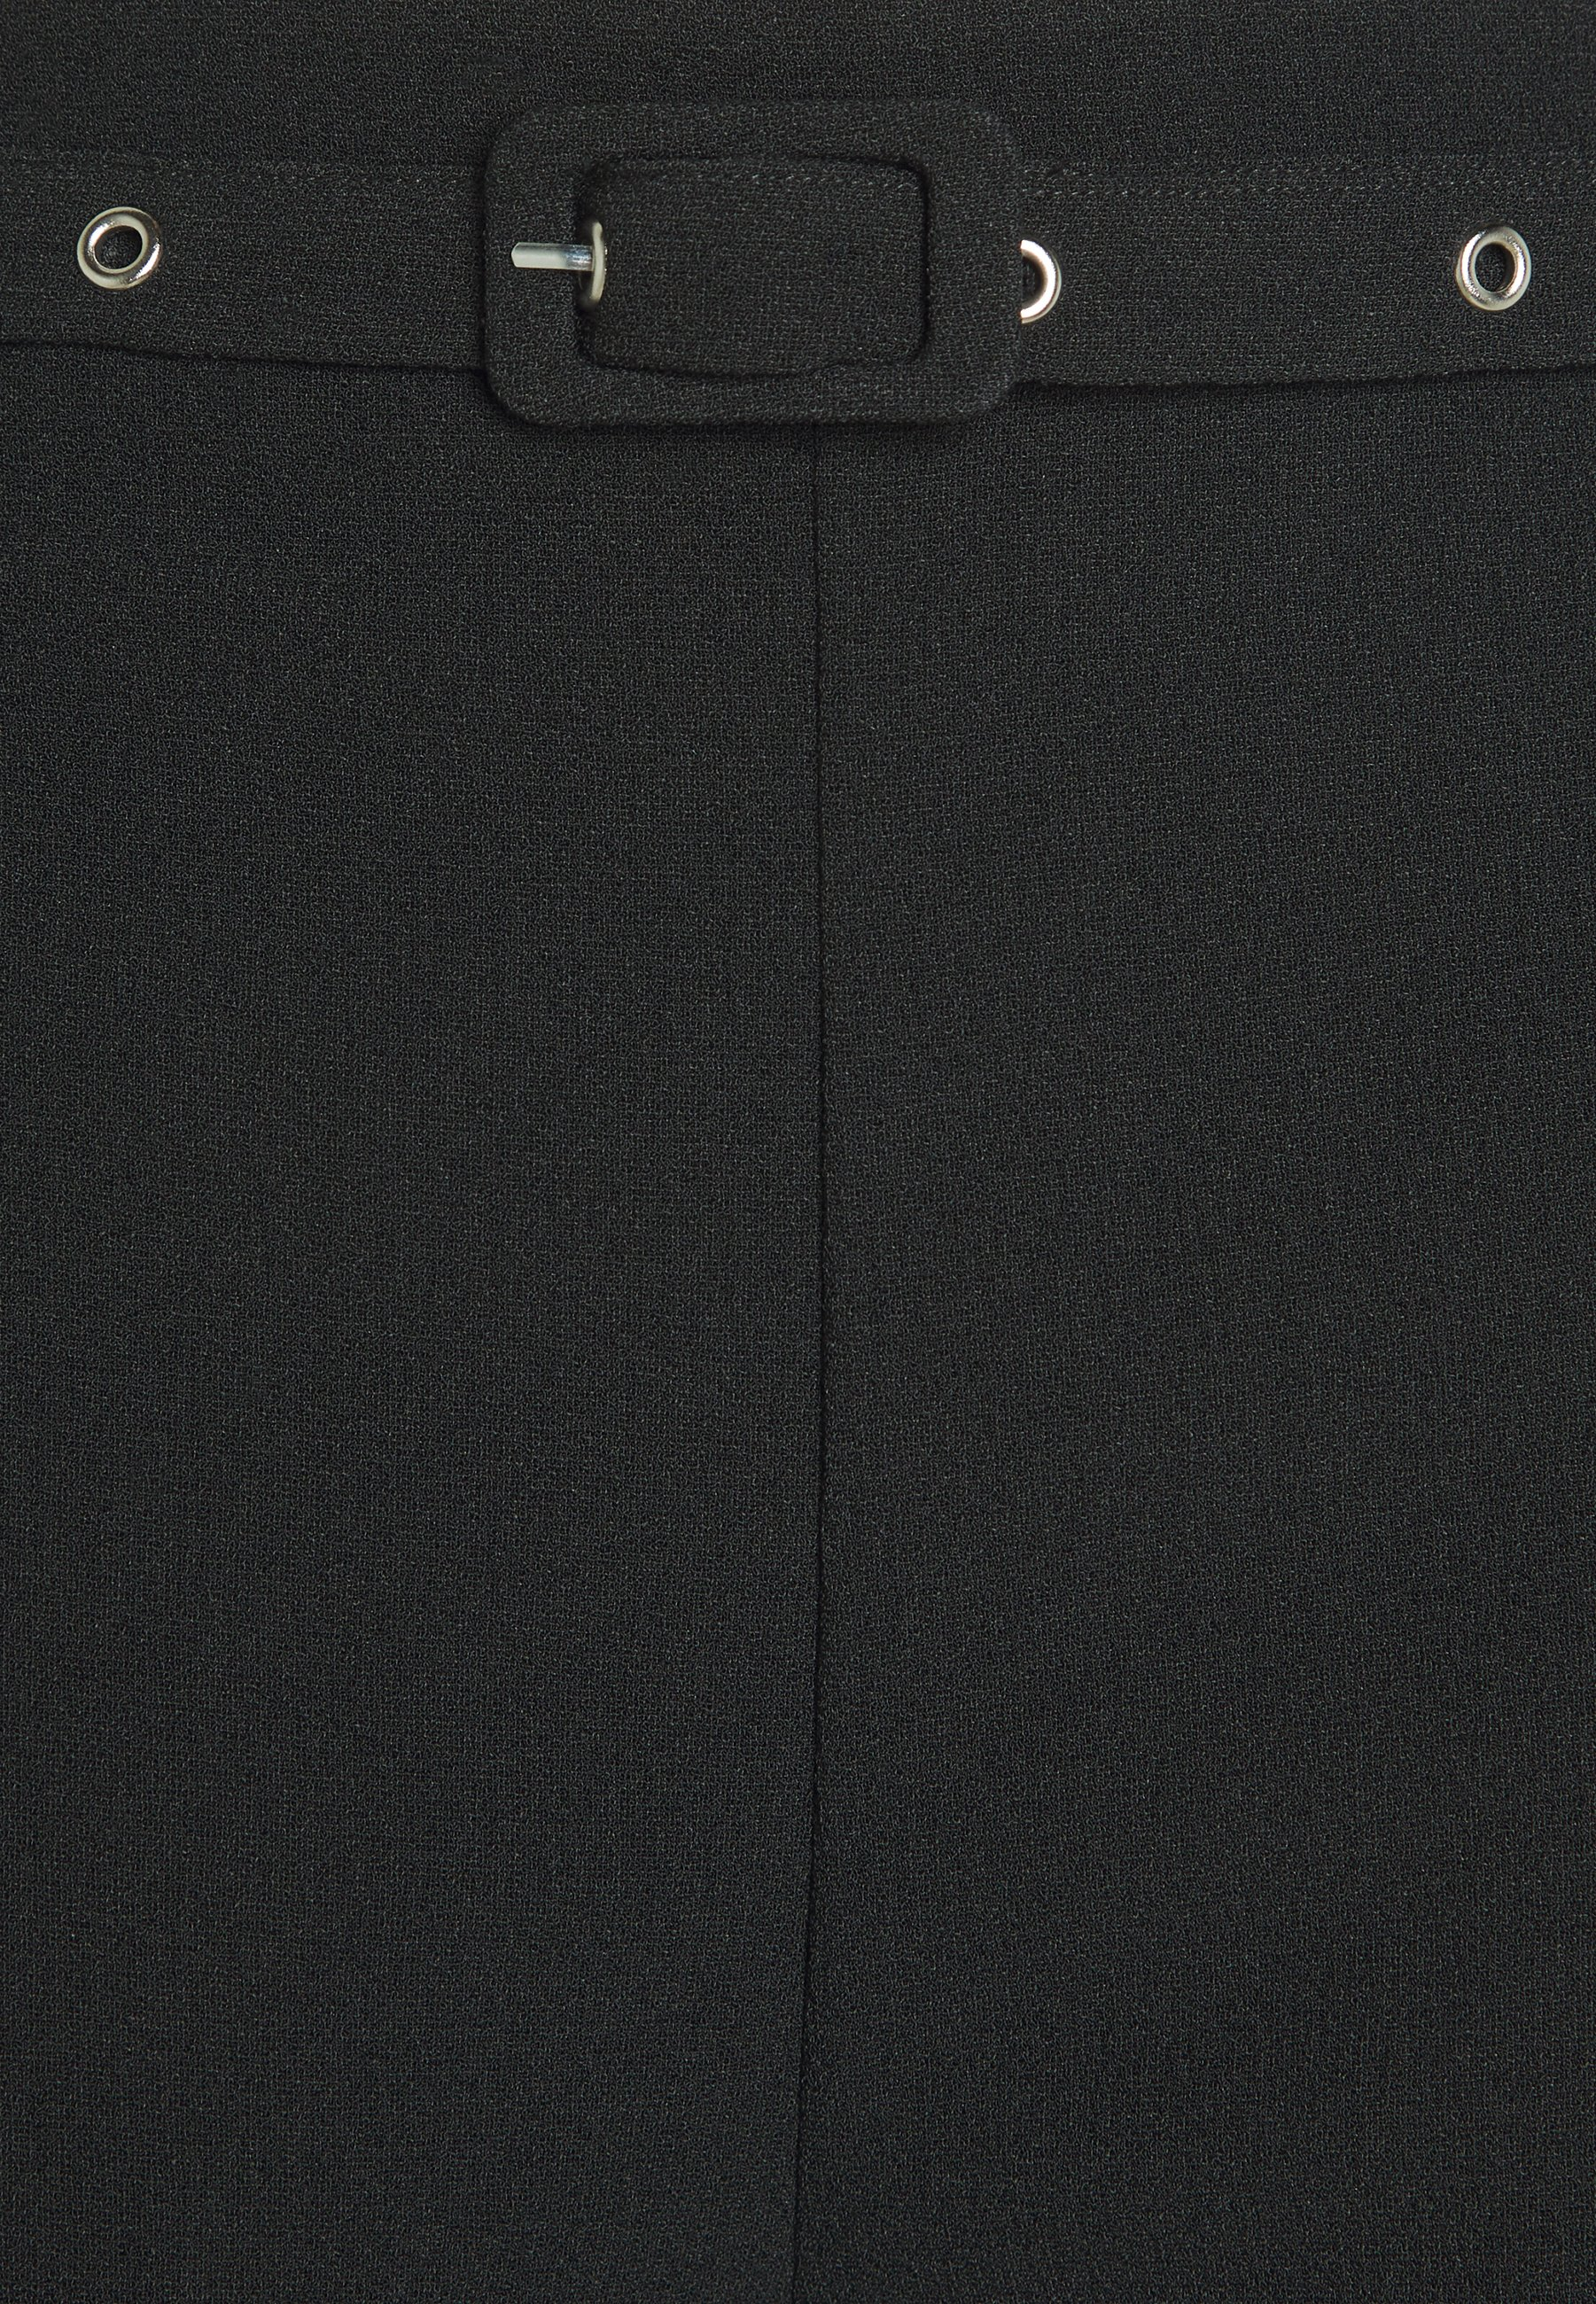 Limited New Women's Clothing Modström EDWIN PANTS Trousers black a52khwrOy